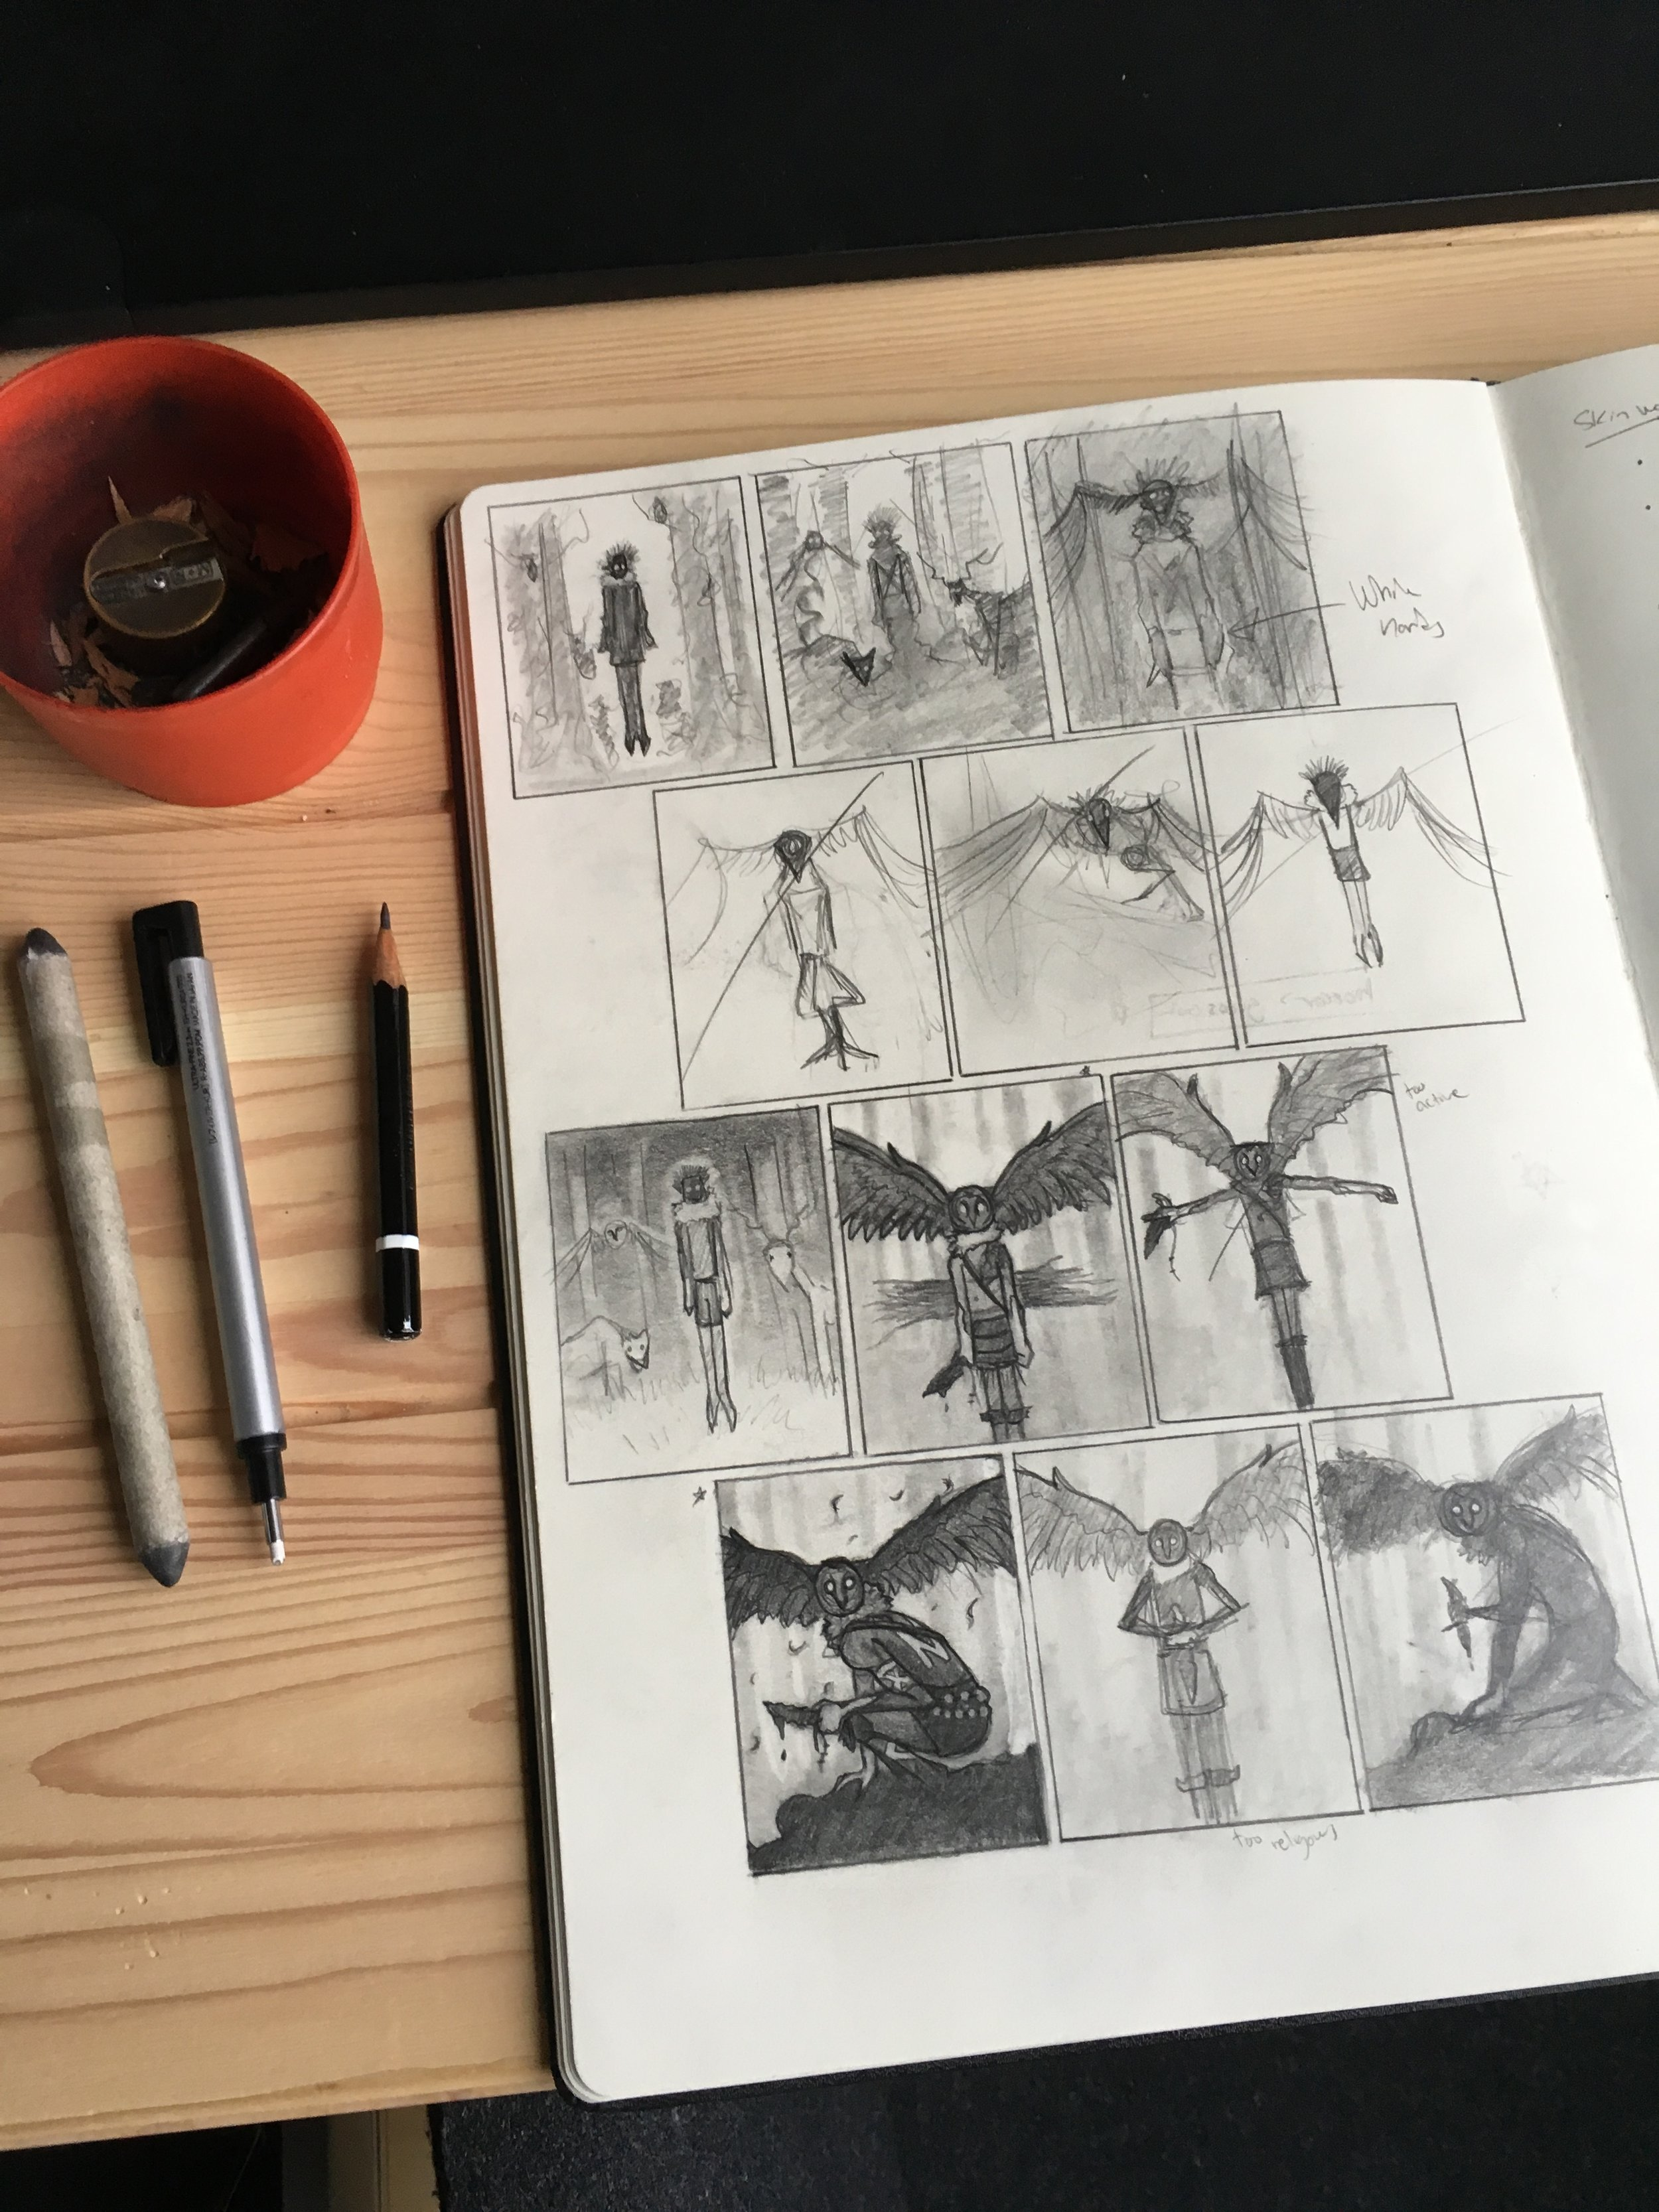 Skinwalker Thumbnail Drawings